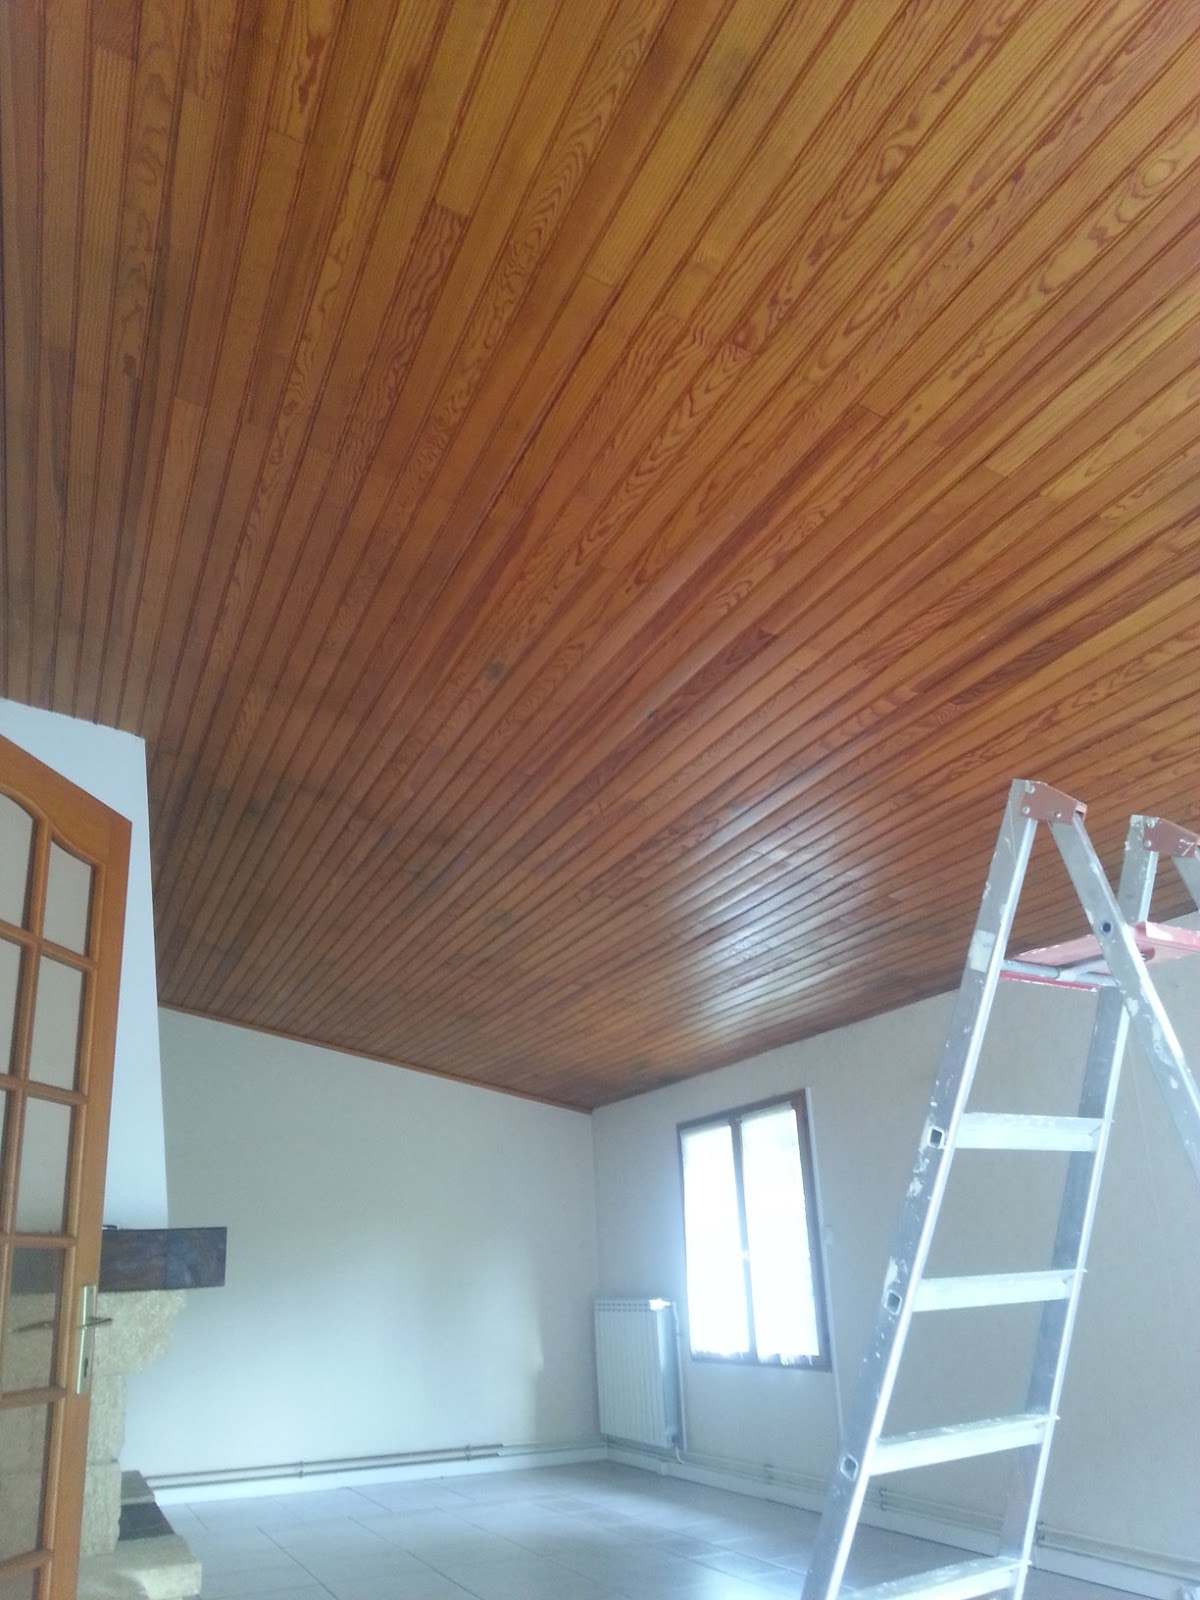 placo plafond suspendu awesome pose de rail plafond with poser un faux plafond with placo. Black Bedroom Furniture Sets. Home Design Ideas